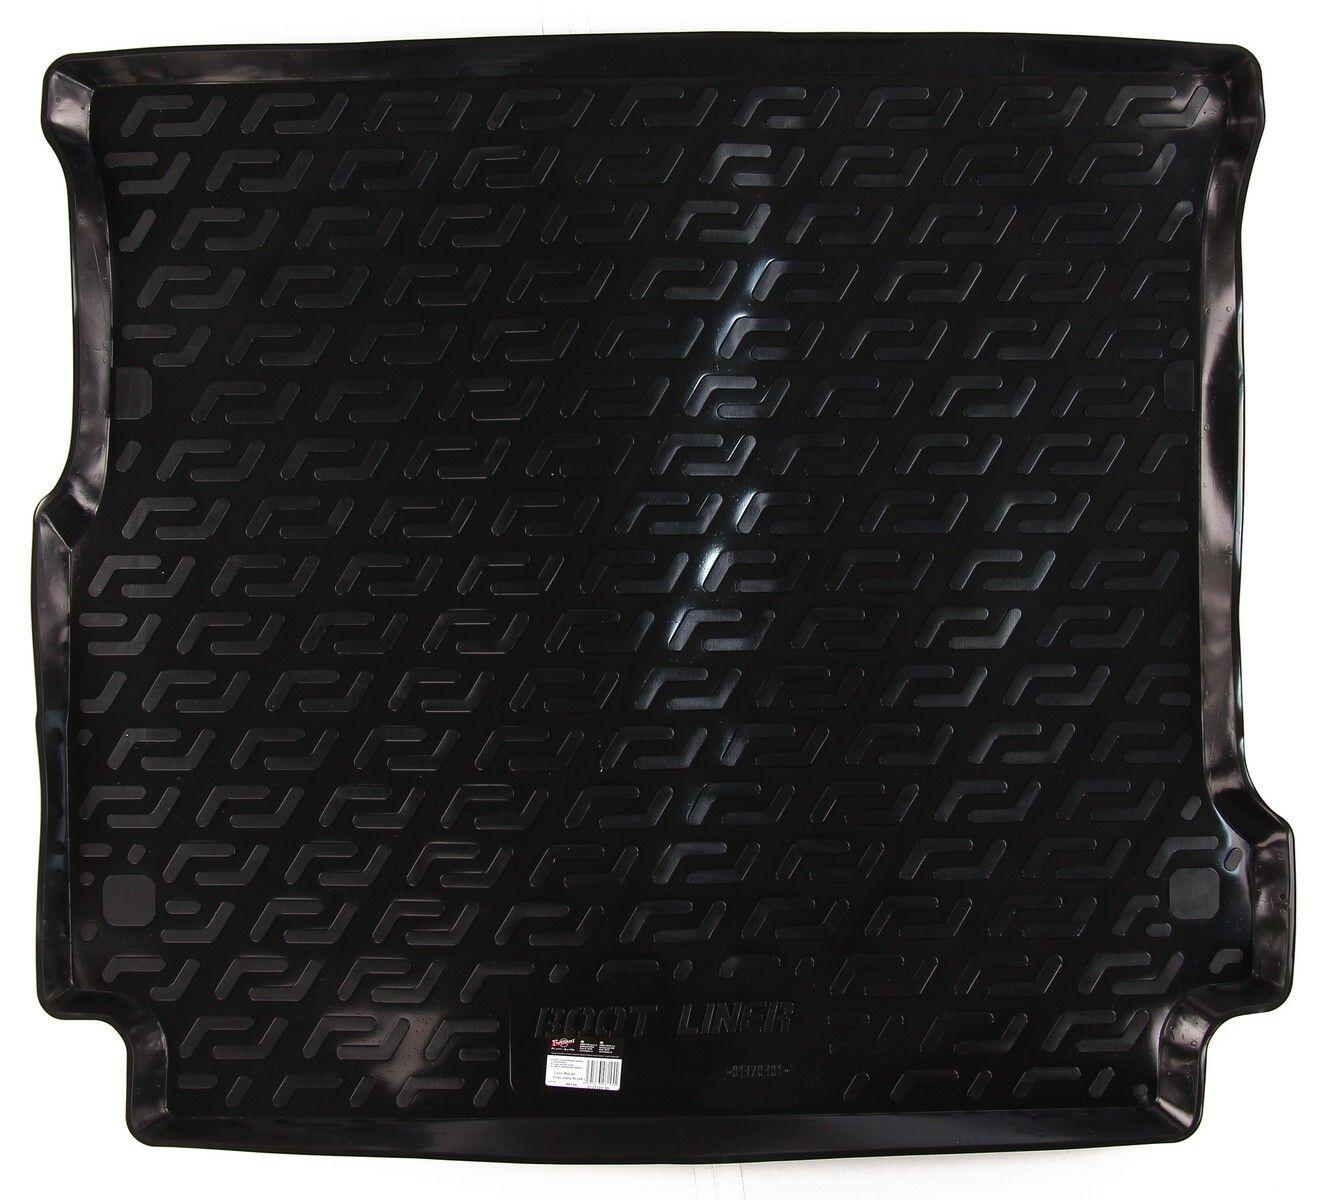 Vana do kufru plastová Land Rover Discovery III (TAA) / LR3 (04-09) SIXTOL